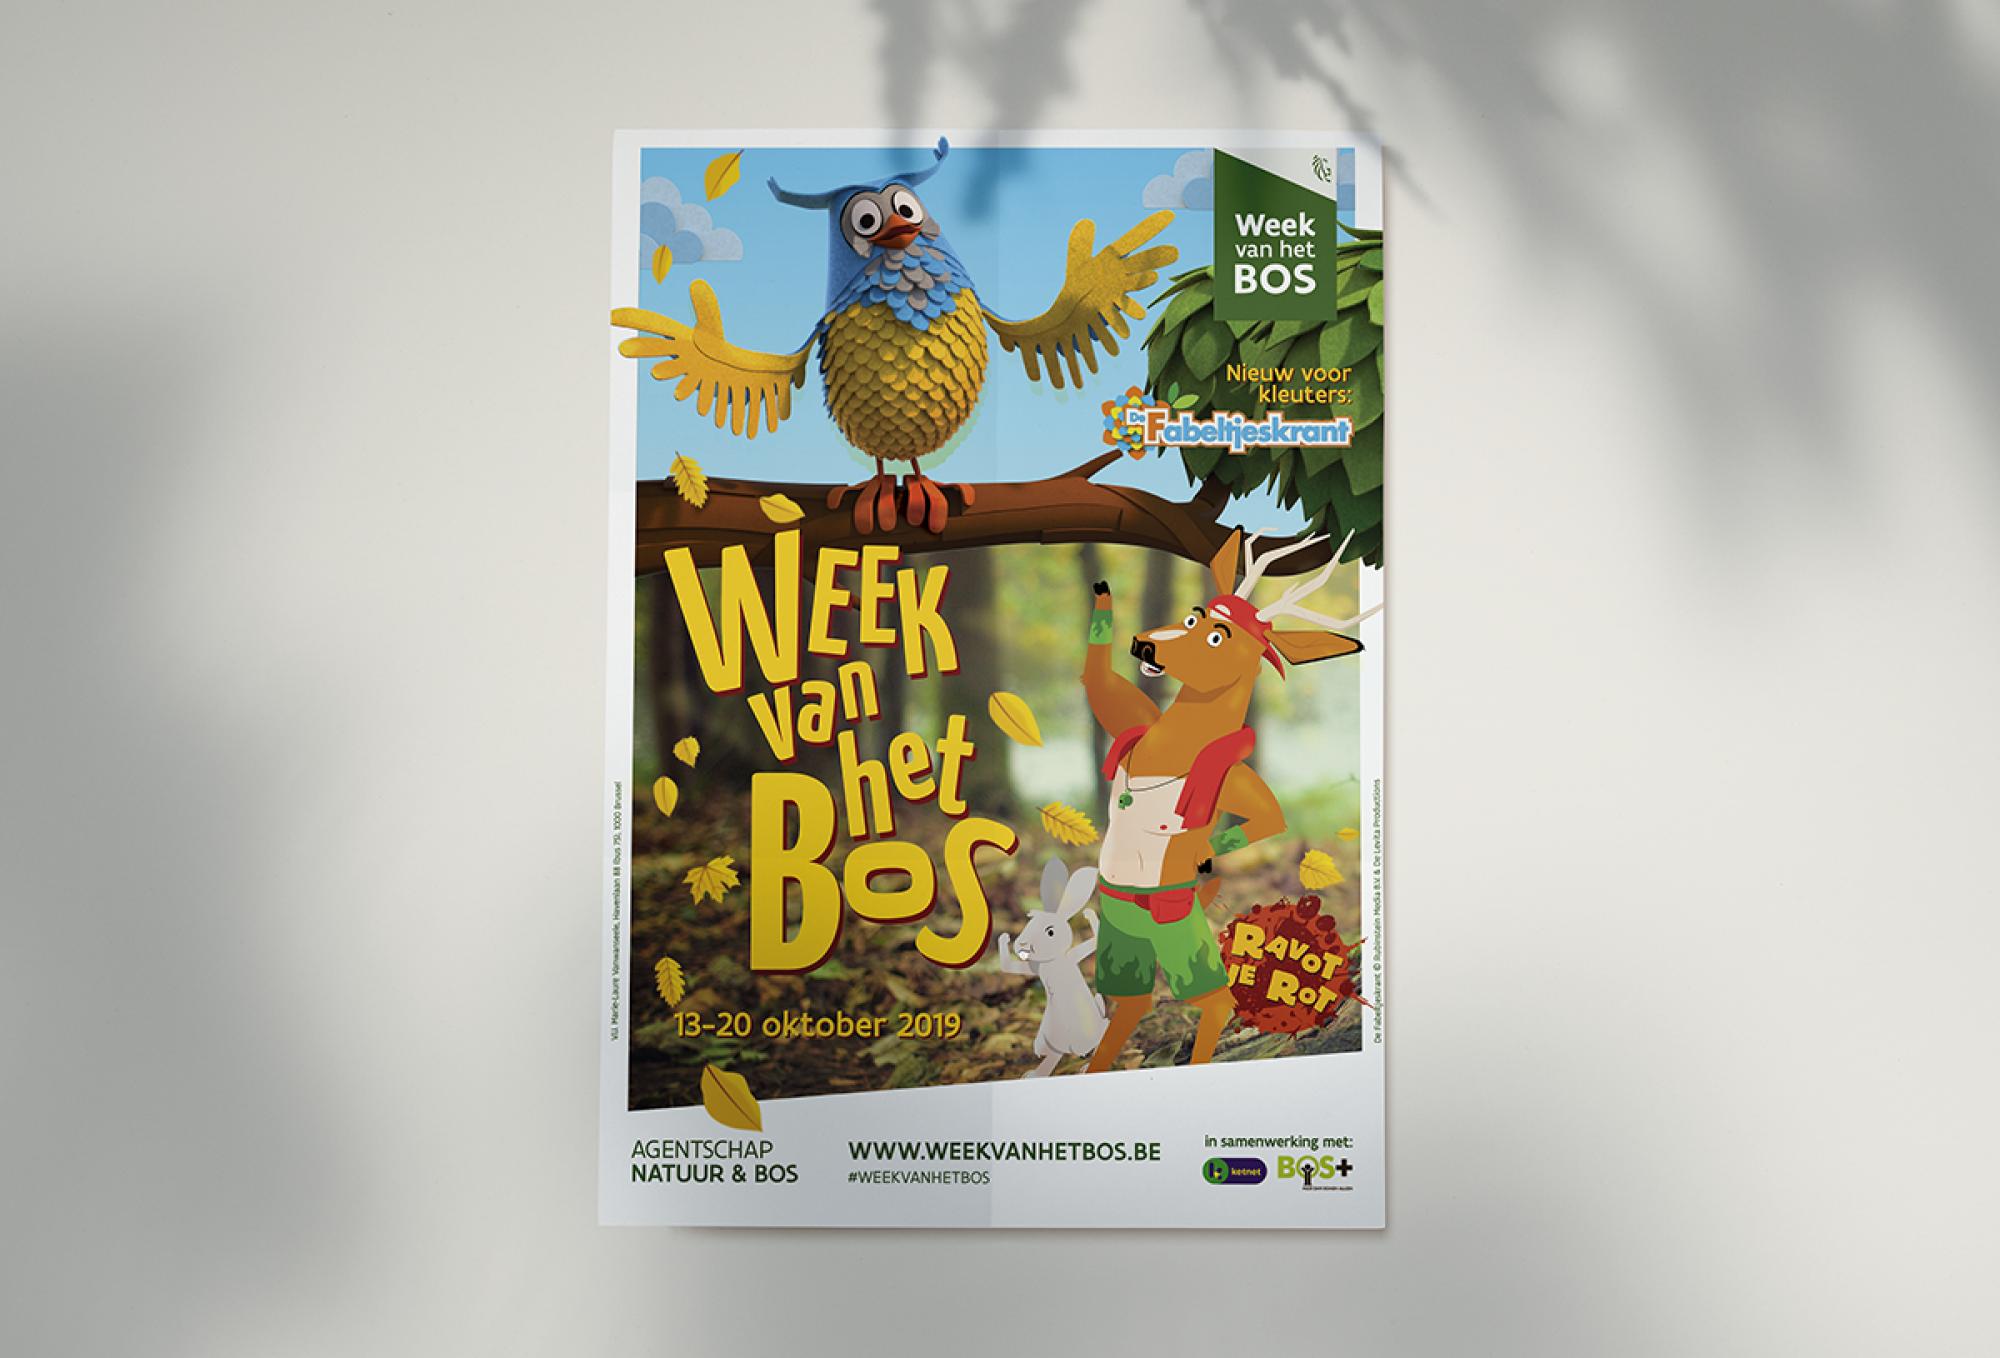 Week van het Bos - Fabeltjeskrant